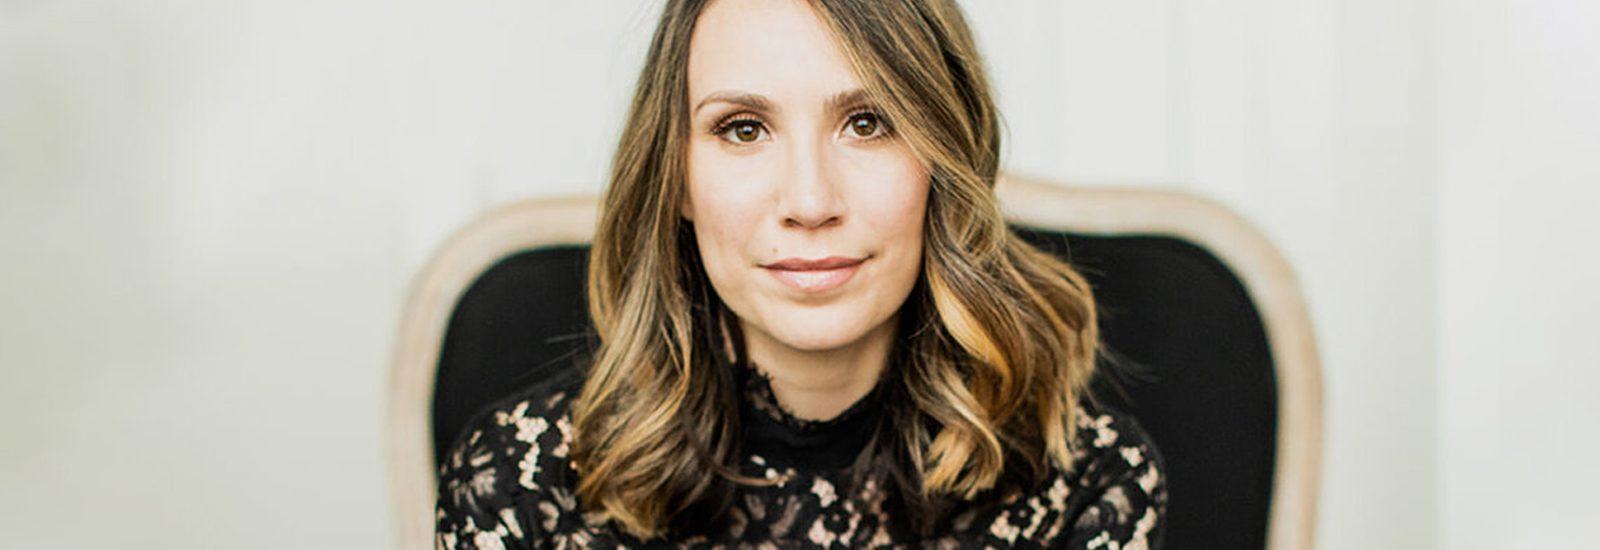 Kate Crocco